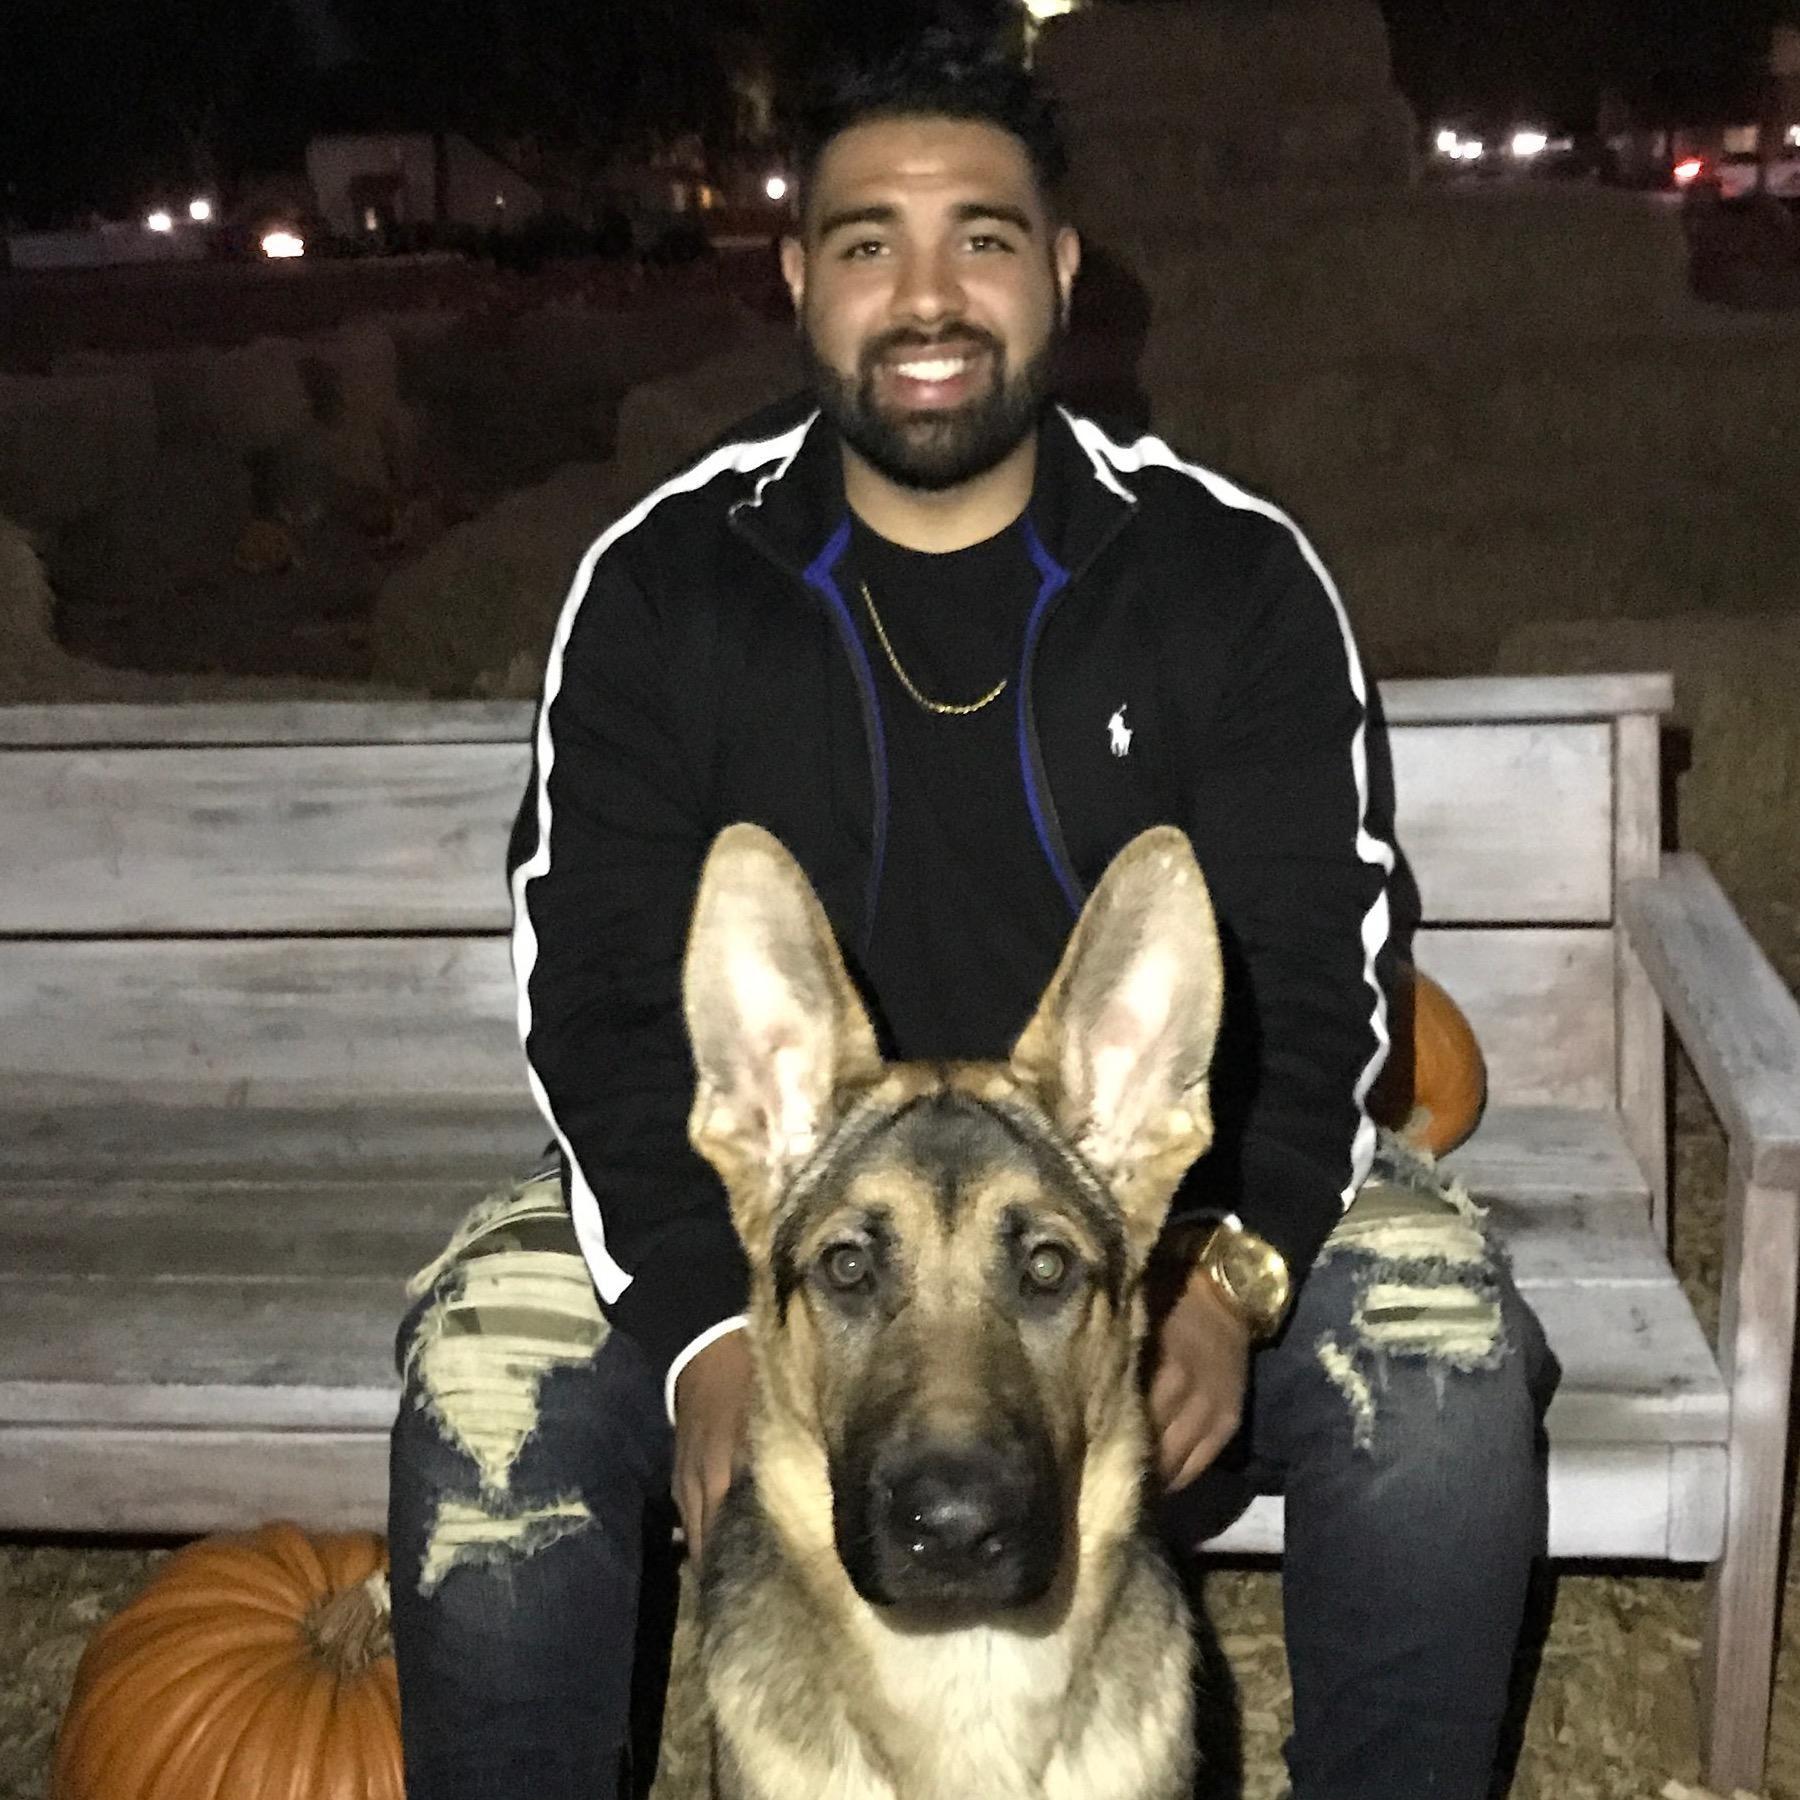 Julio's dog boarding